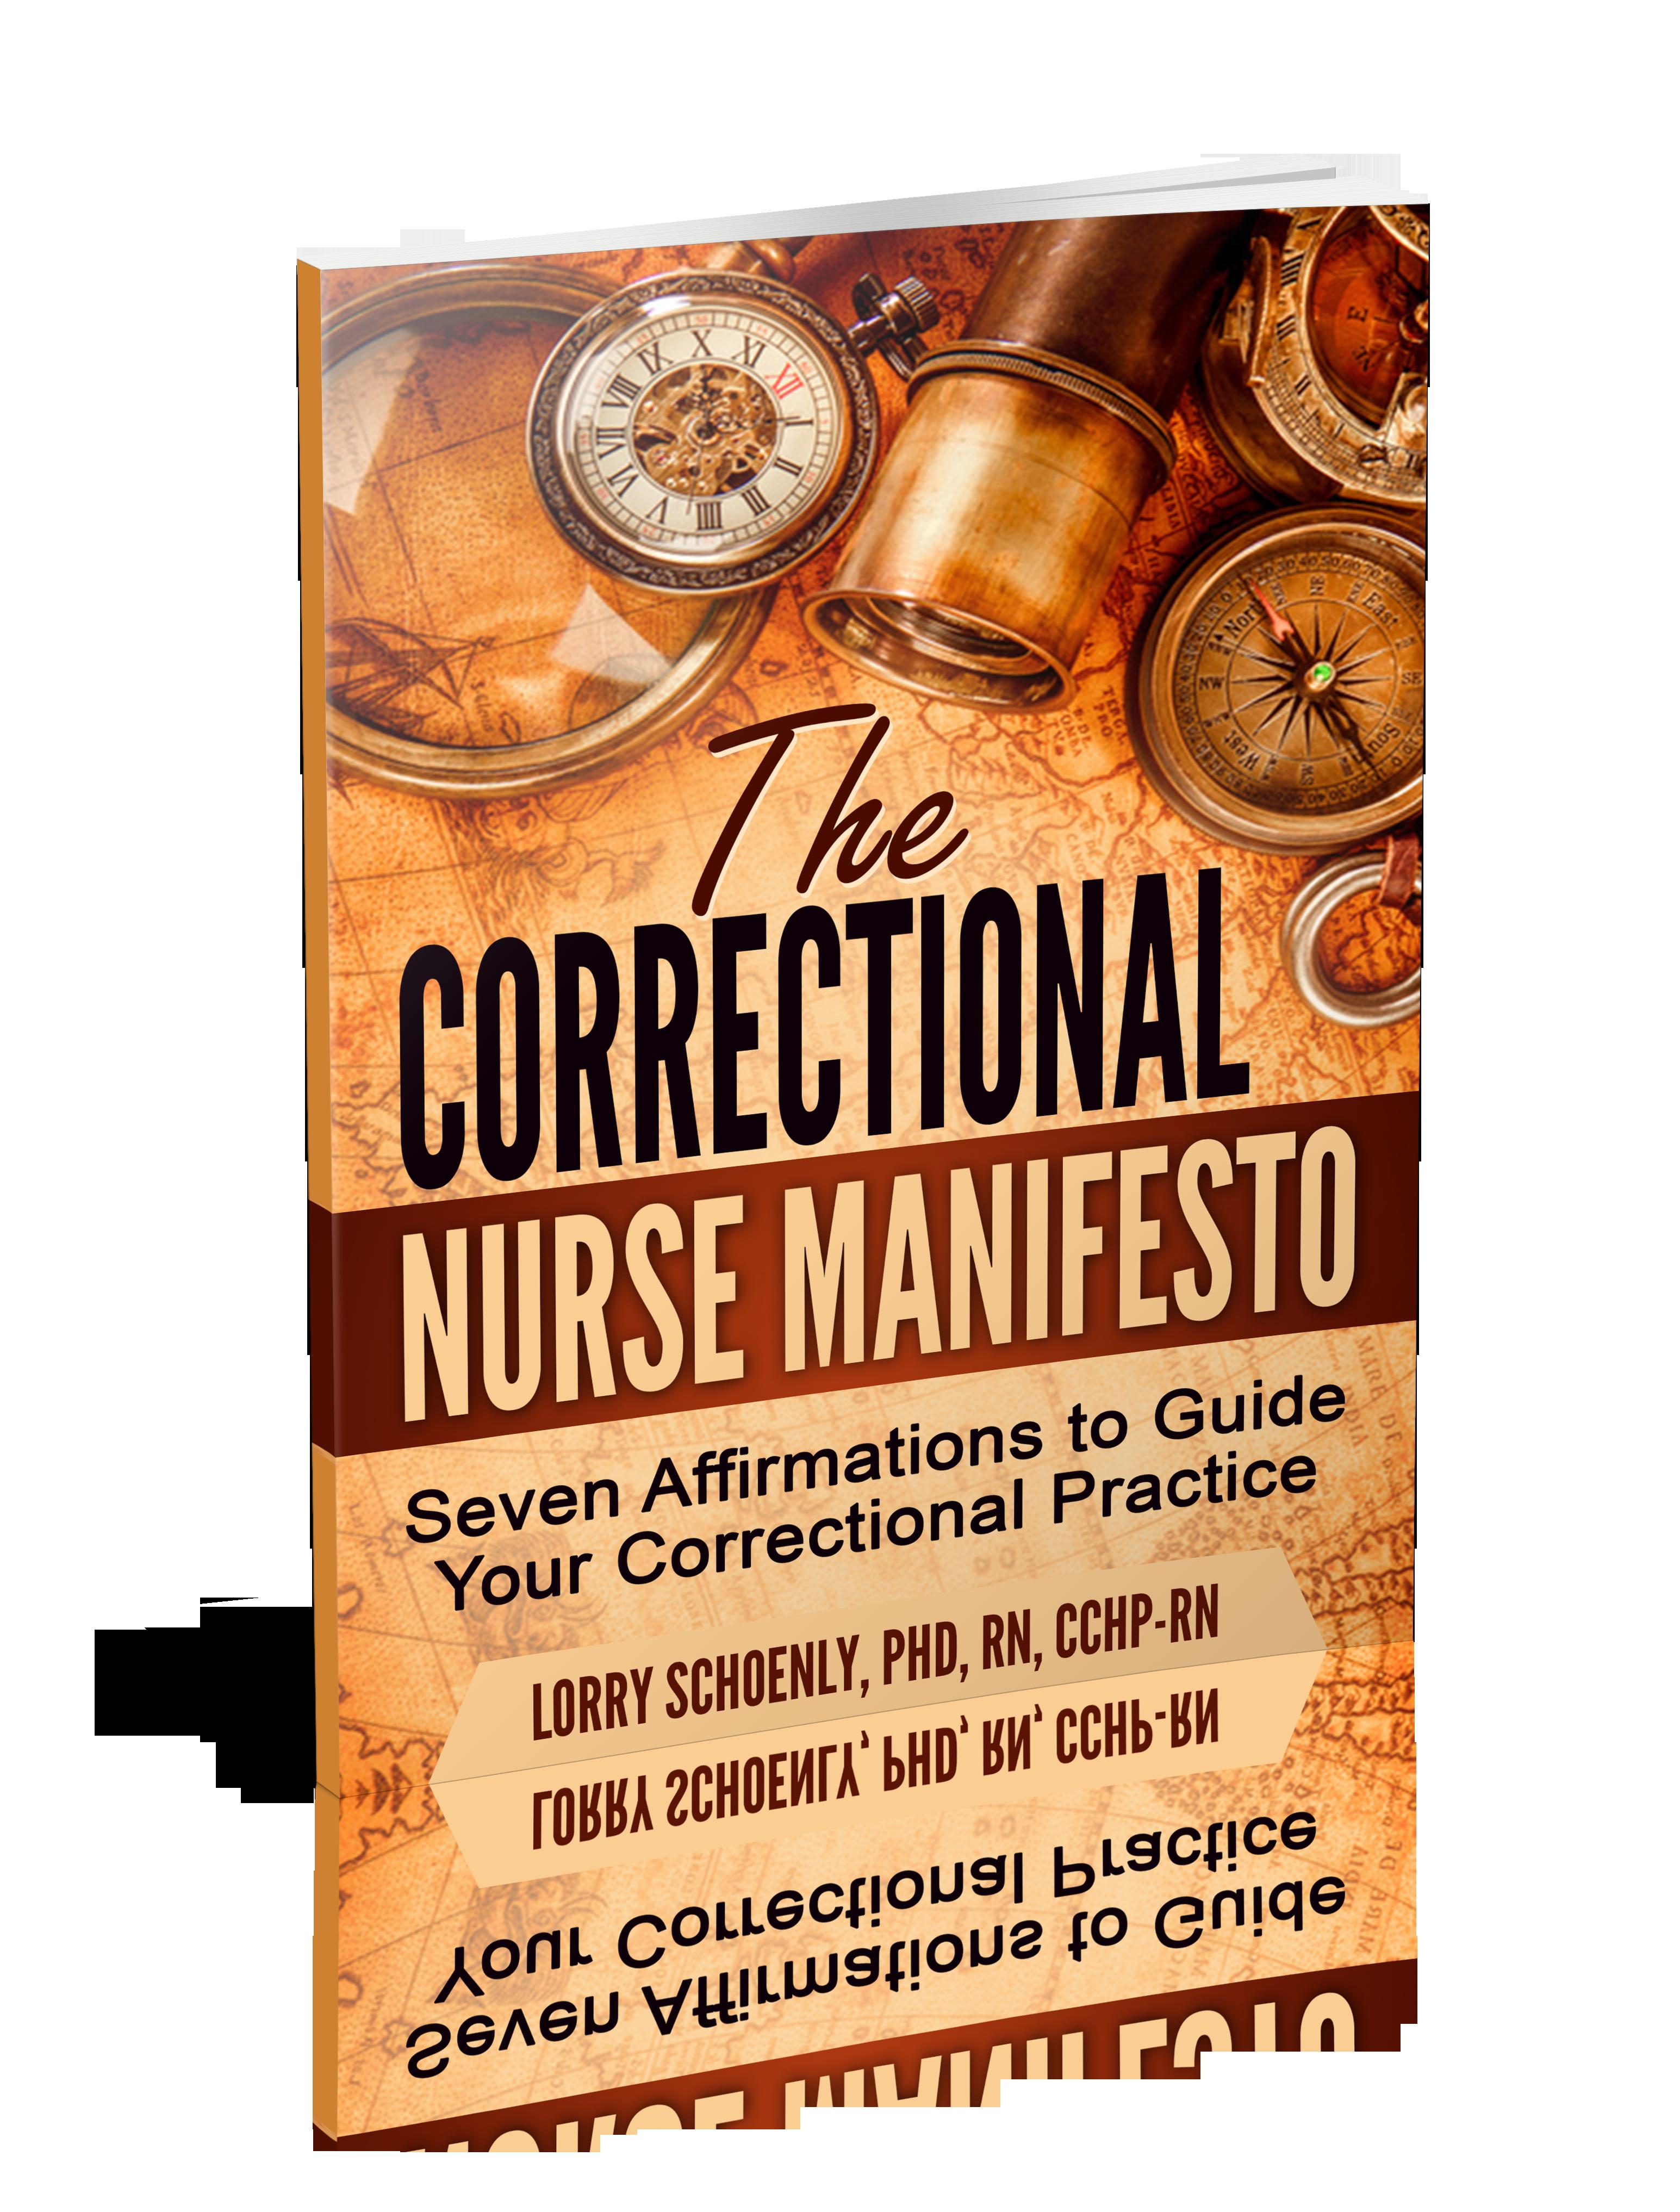 Correctional Nurse Manifesto